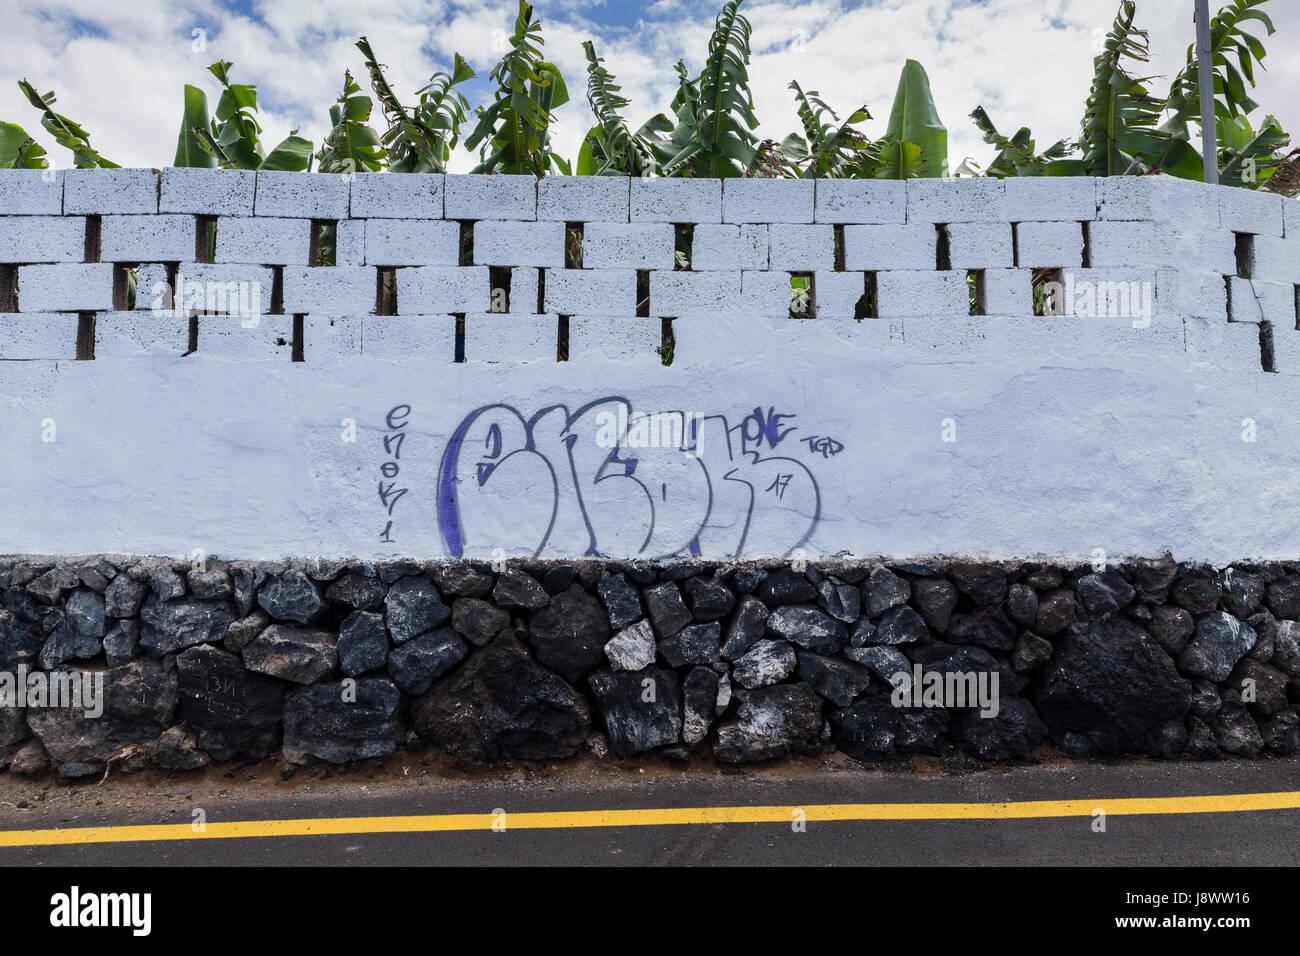 Graffiti painted with name enok on wall in playa san juan tenerife canary islands